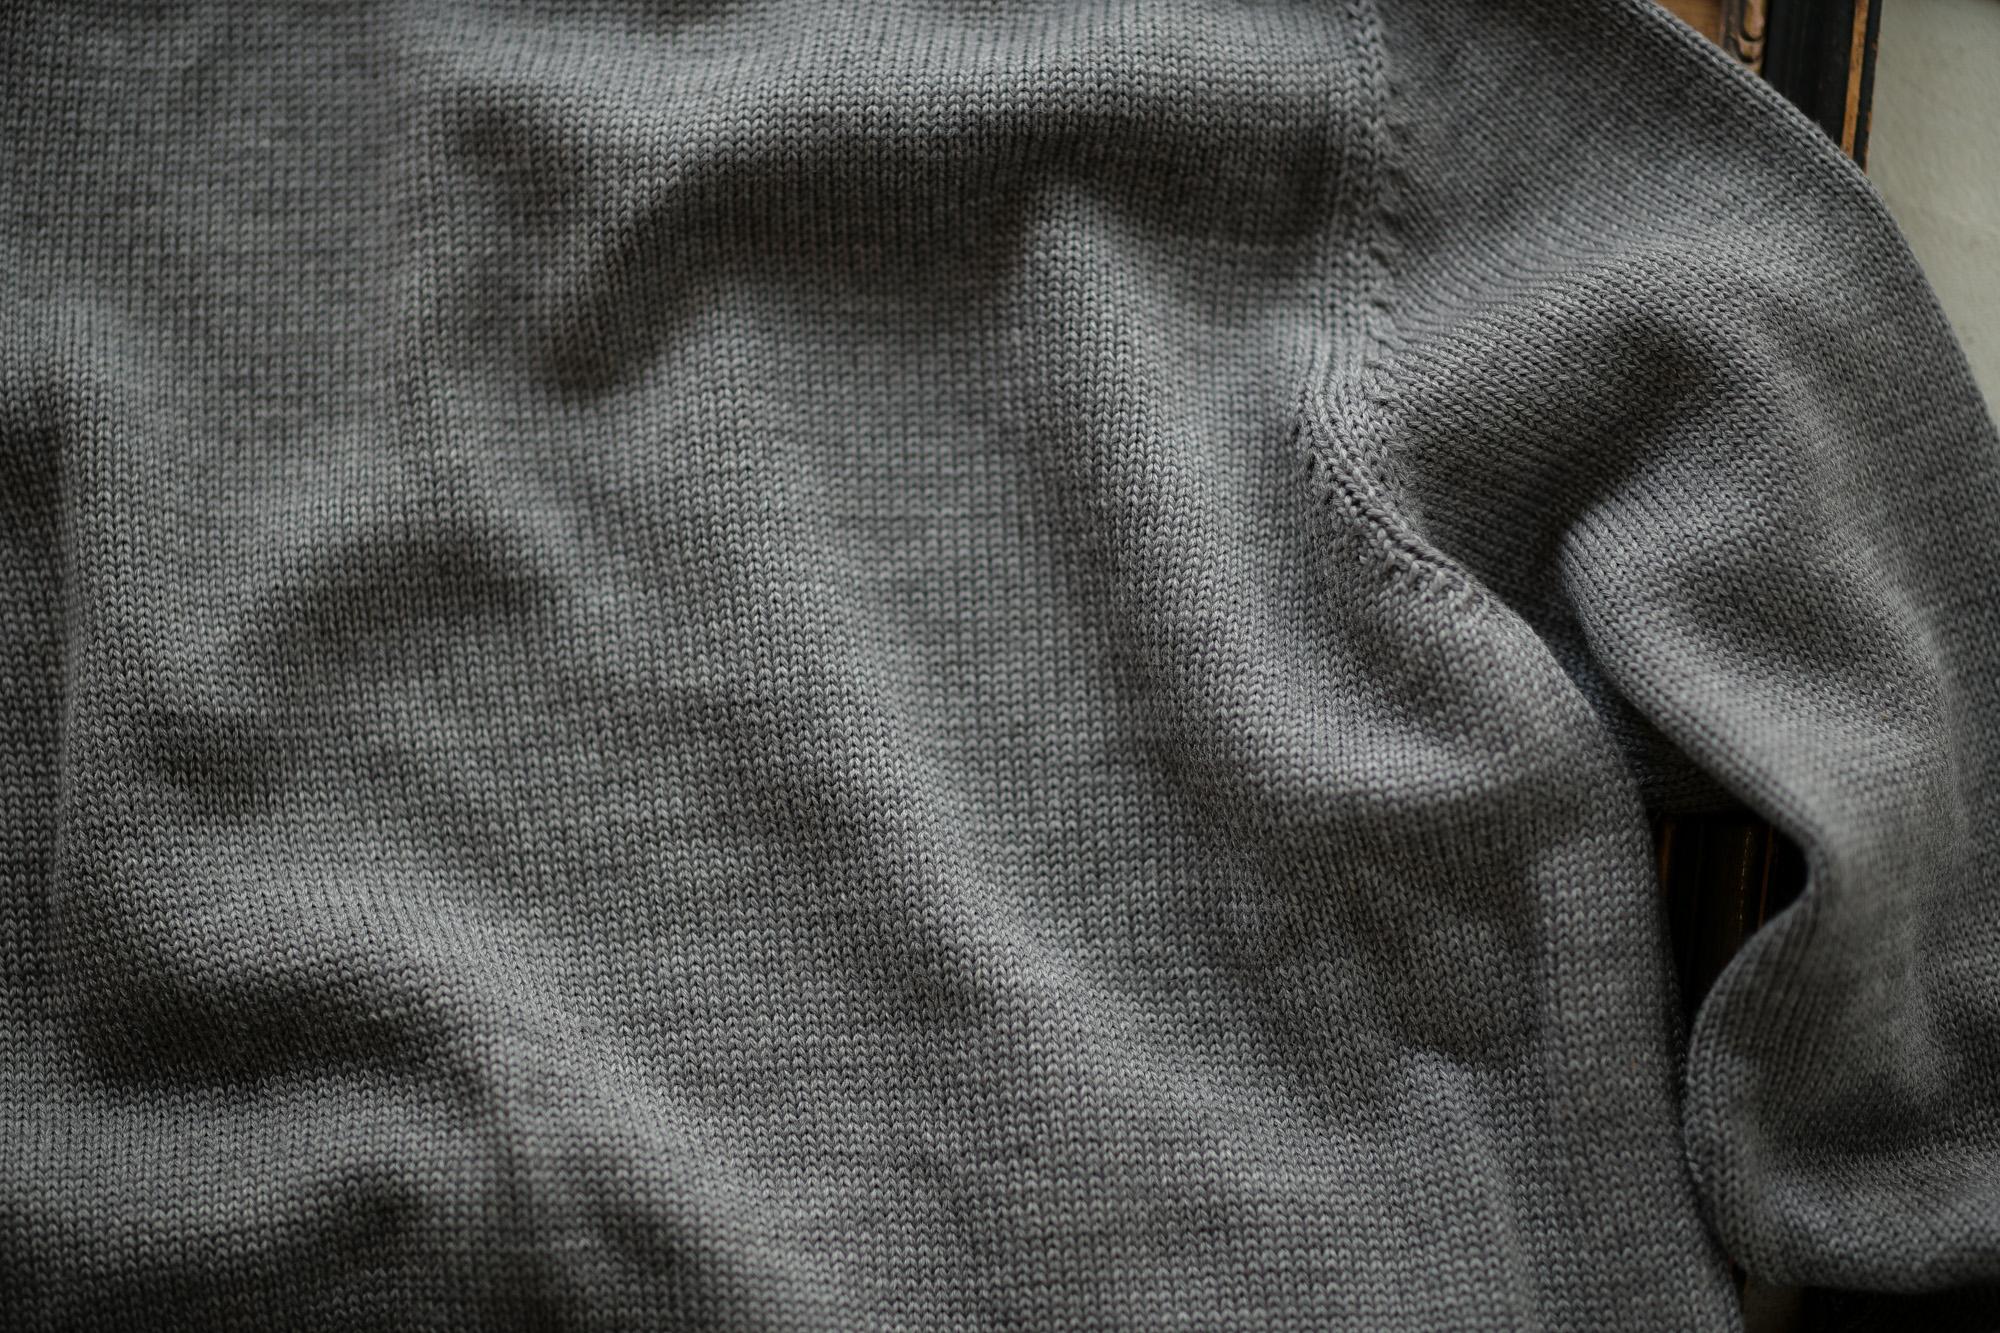 ZANONE (ザノーネ) CHIOTO KYOTO (キョウト キョート) 810740 z0229 (ミドルゲージ ニット ジャケット) GRAY (グレー・Z4872) MADE IN ITALY(イタリア製) 2018 秋冬新作 zanone 愛知 名古屋 Alto e Diritto アルト エ デリット alto e diritto アルトエデリット ニット